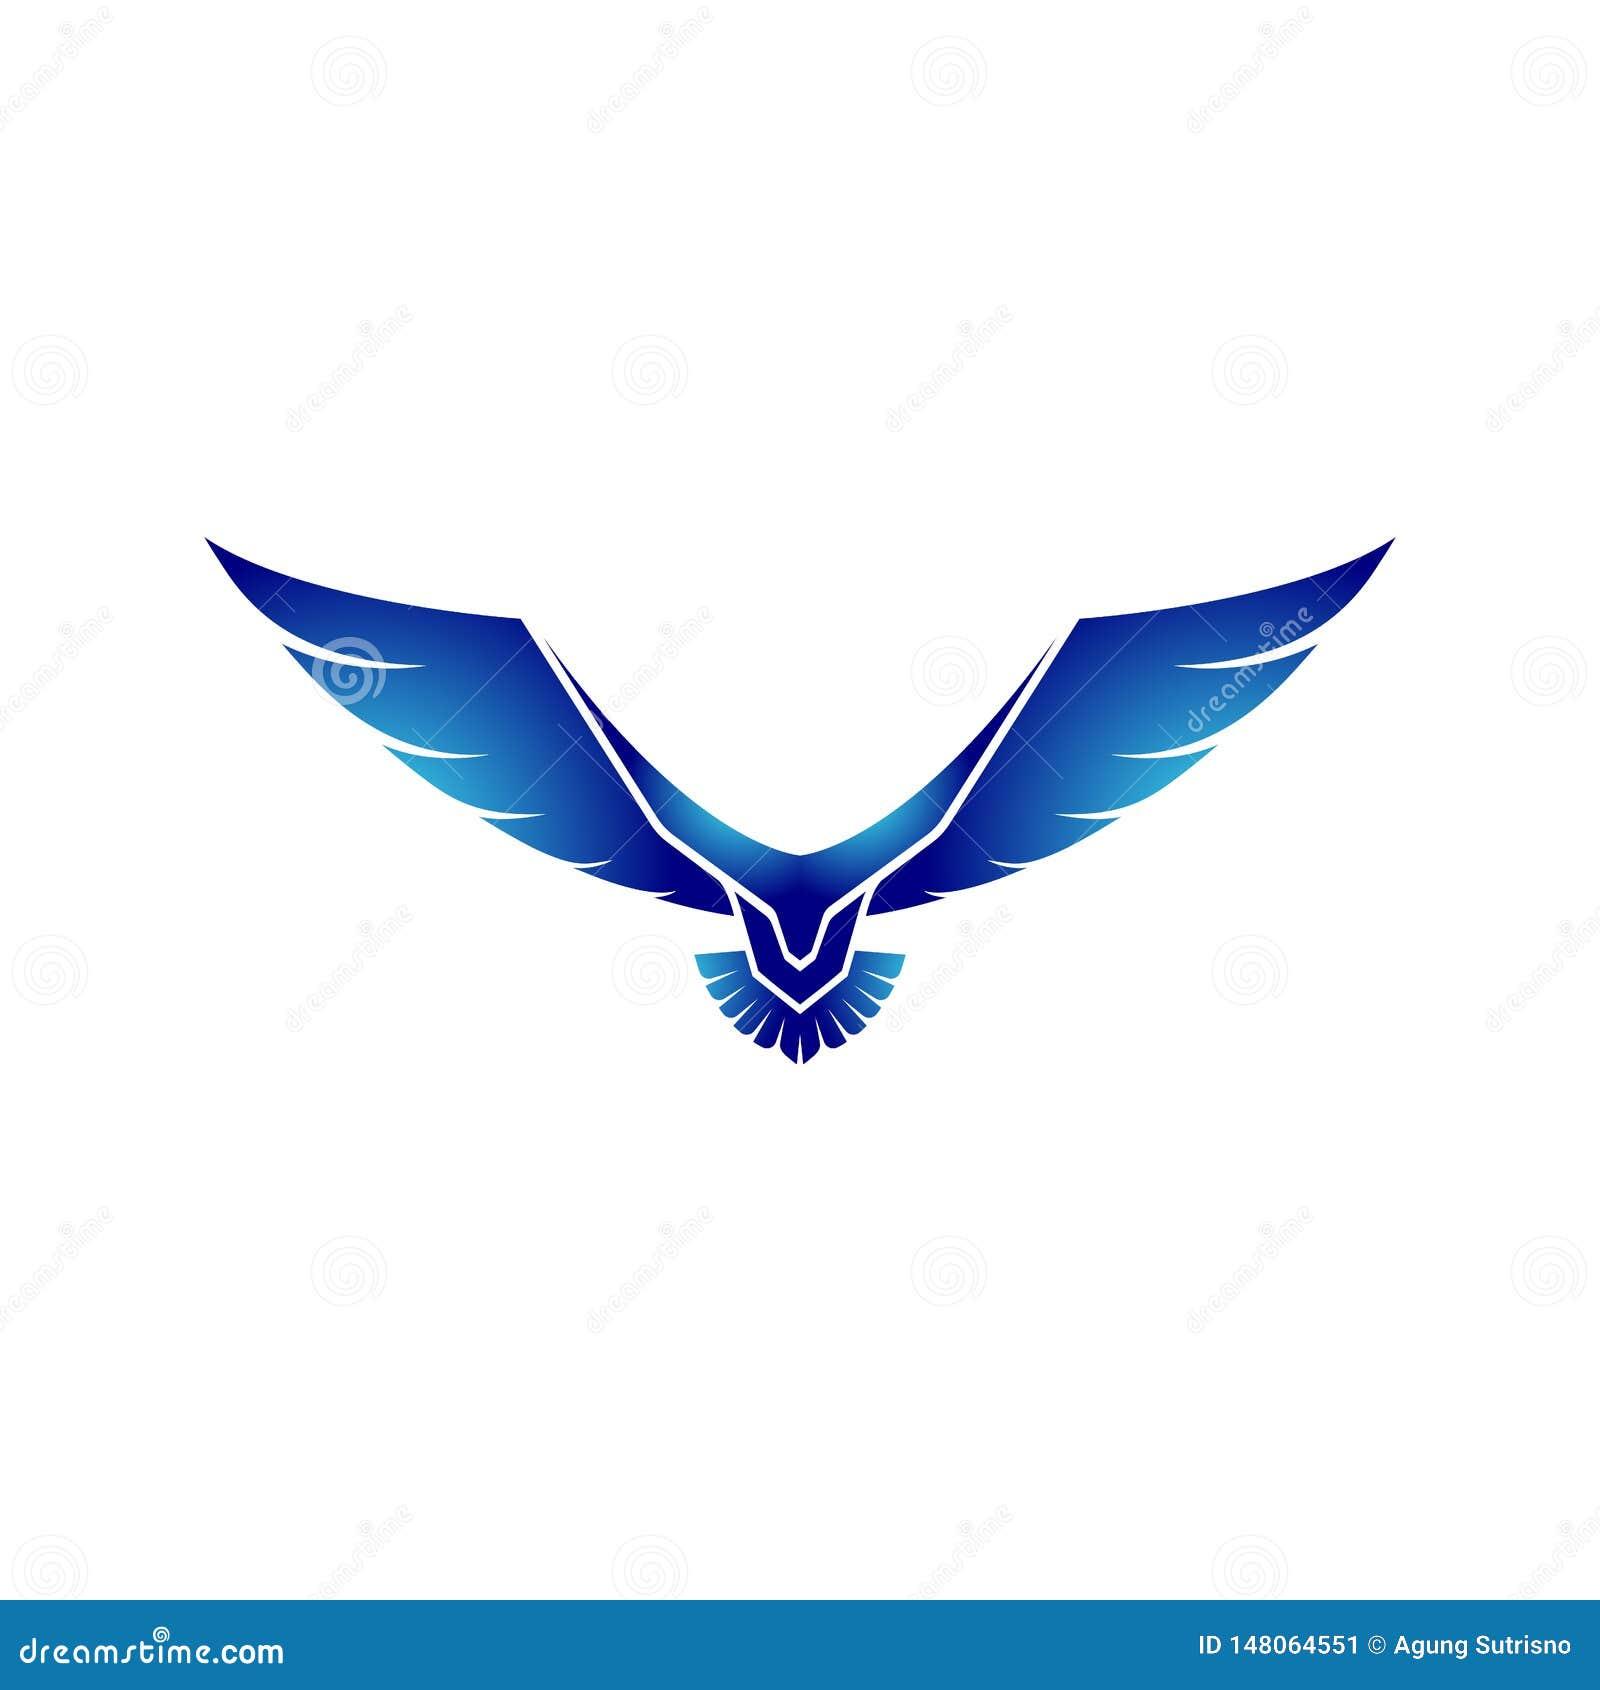 Eagle logo med framtida teknologibegrepp - vektor